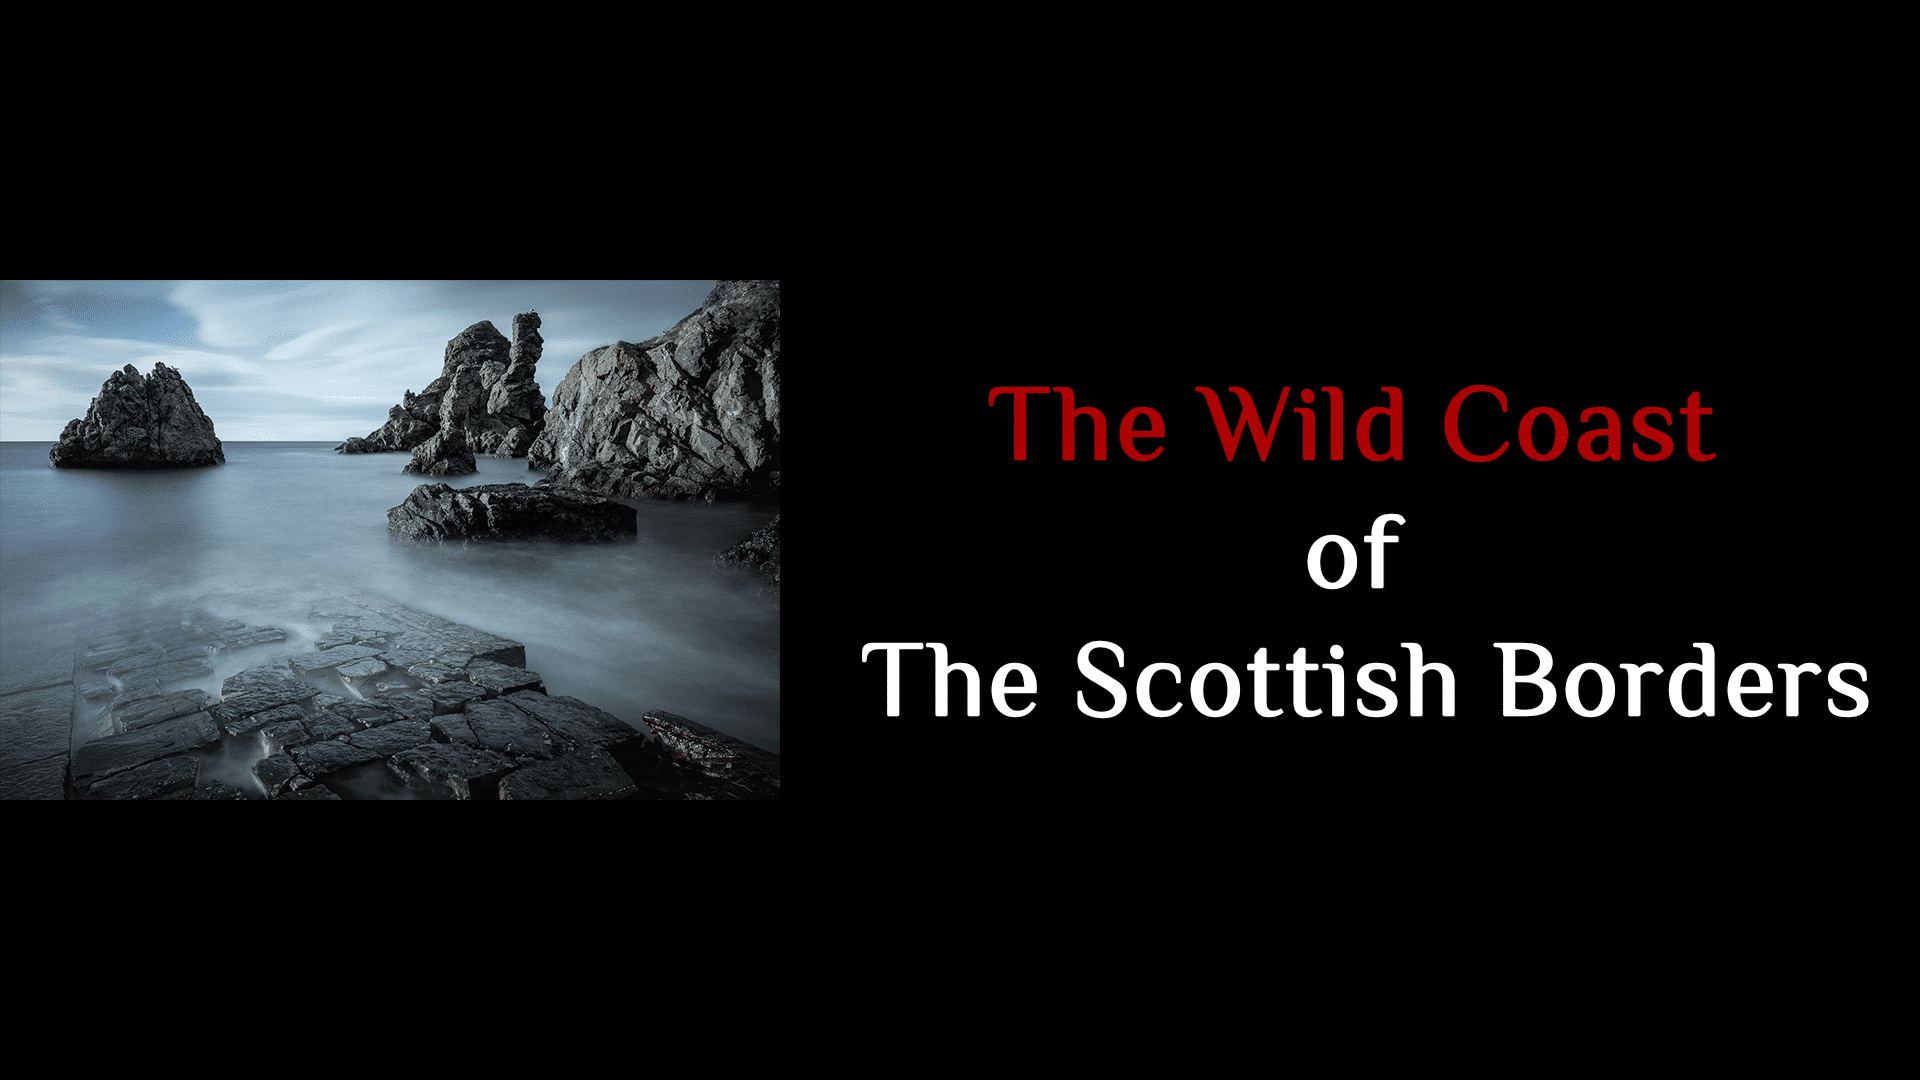 the Wild Coast of the Scottish Borders